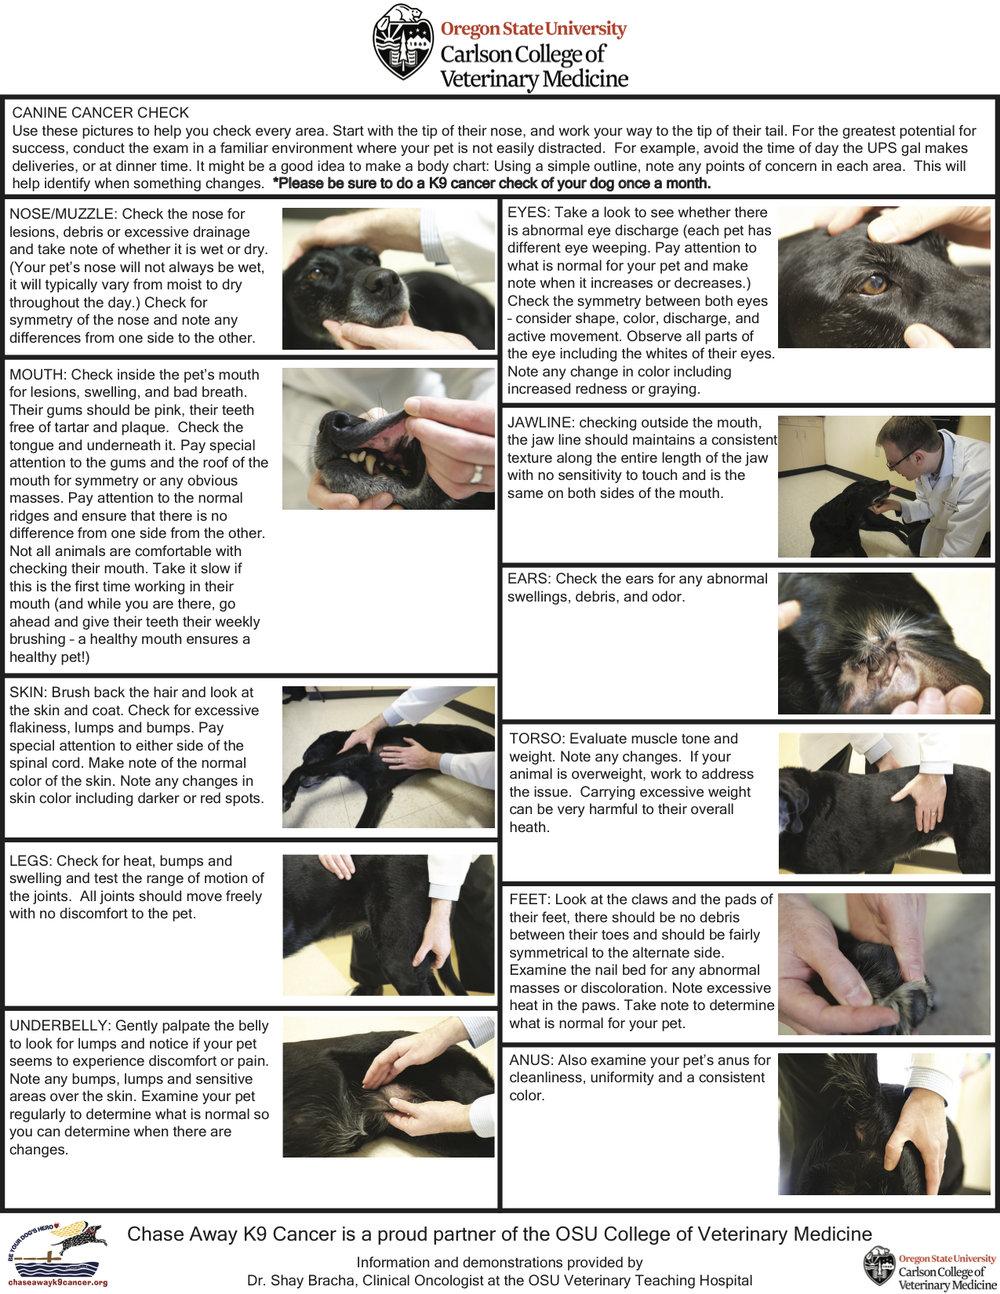 Canine-Cancer-Check-Flyer.jpg